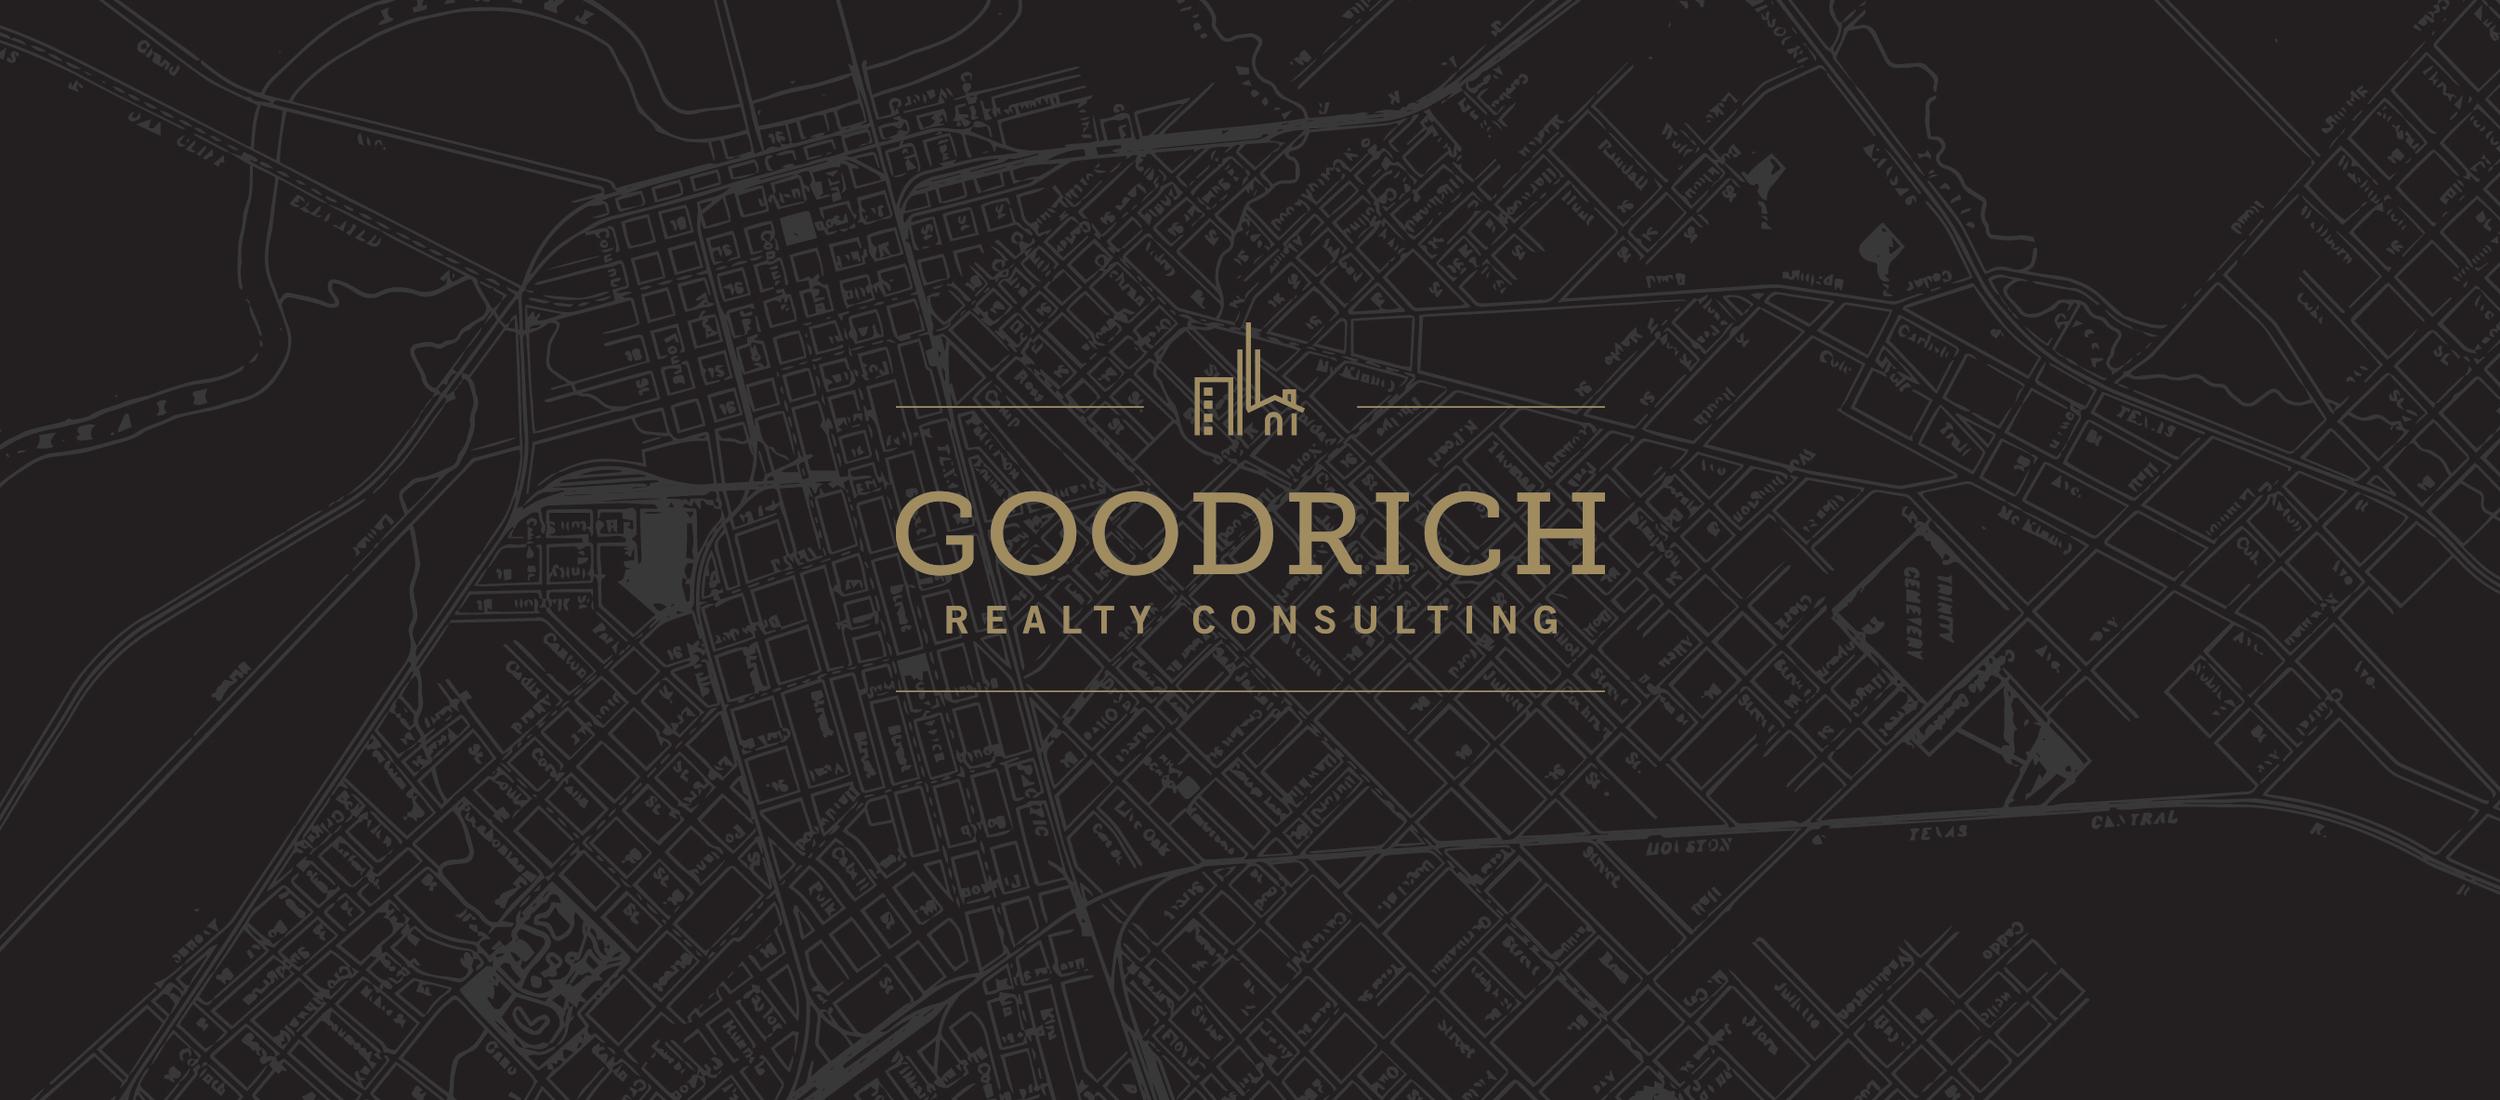 GRC-map with logo.jpg